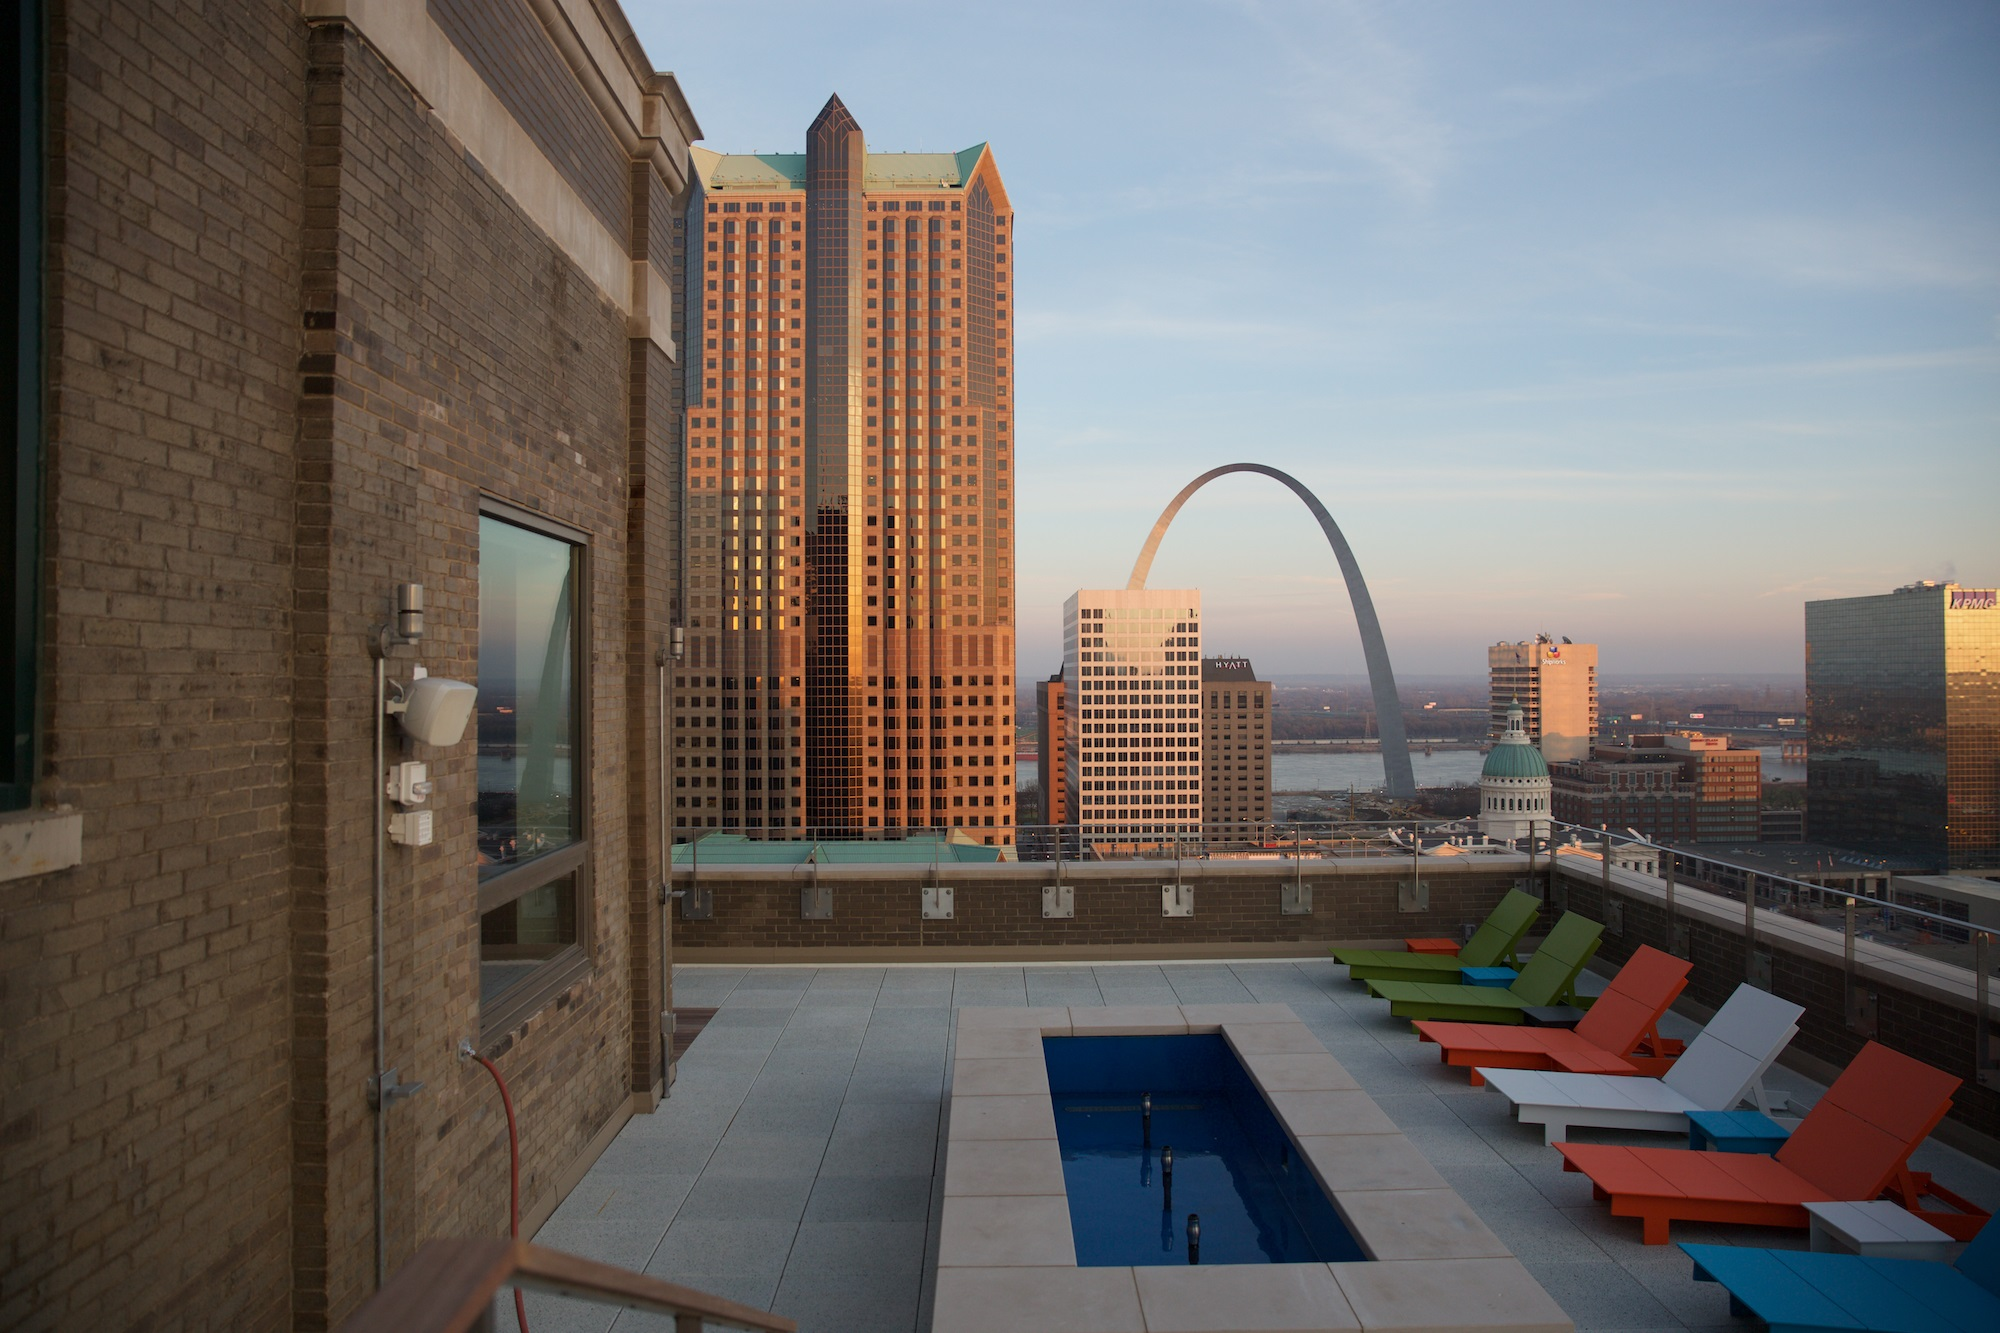 Dominium Turns Historic City Building Into Popular Urban